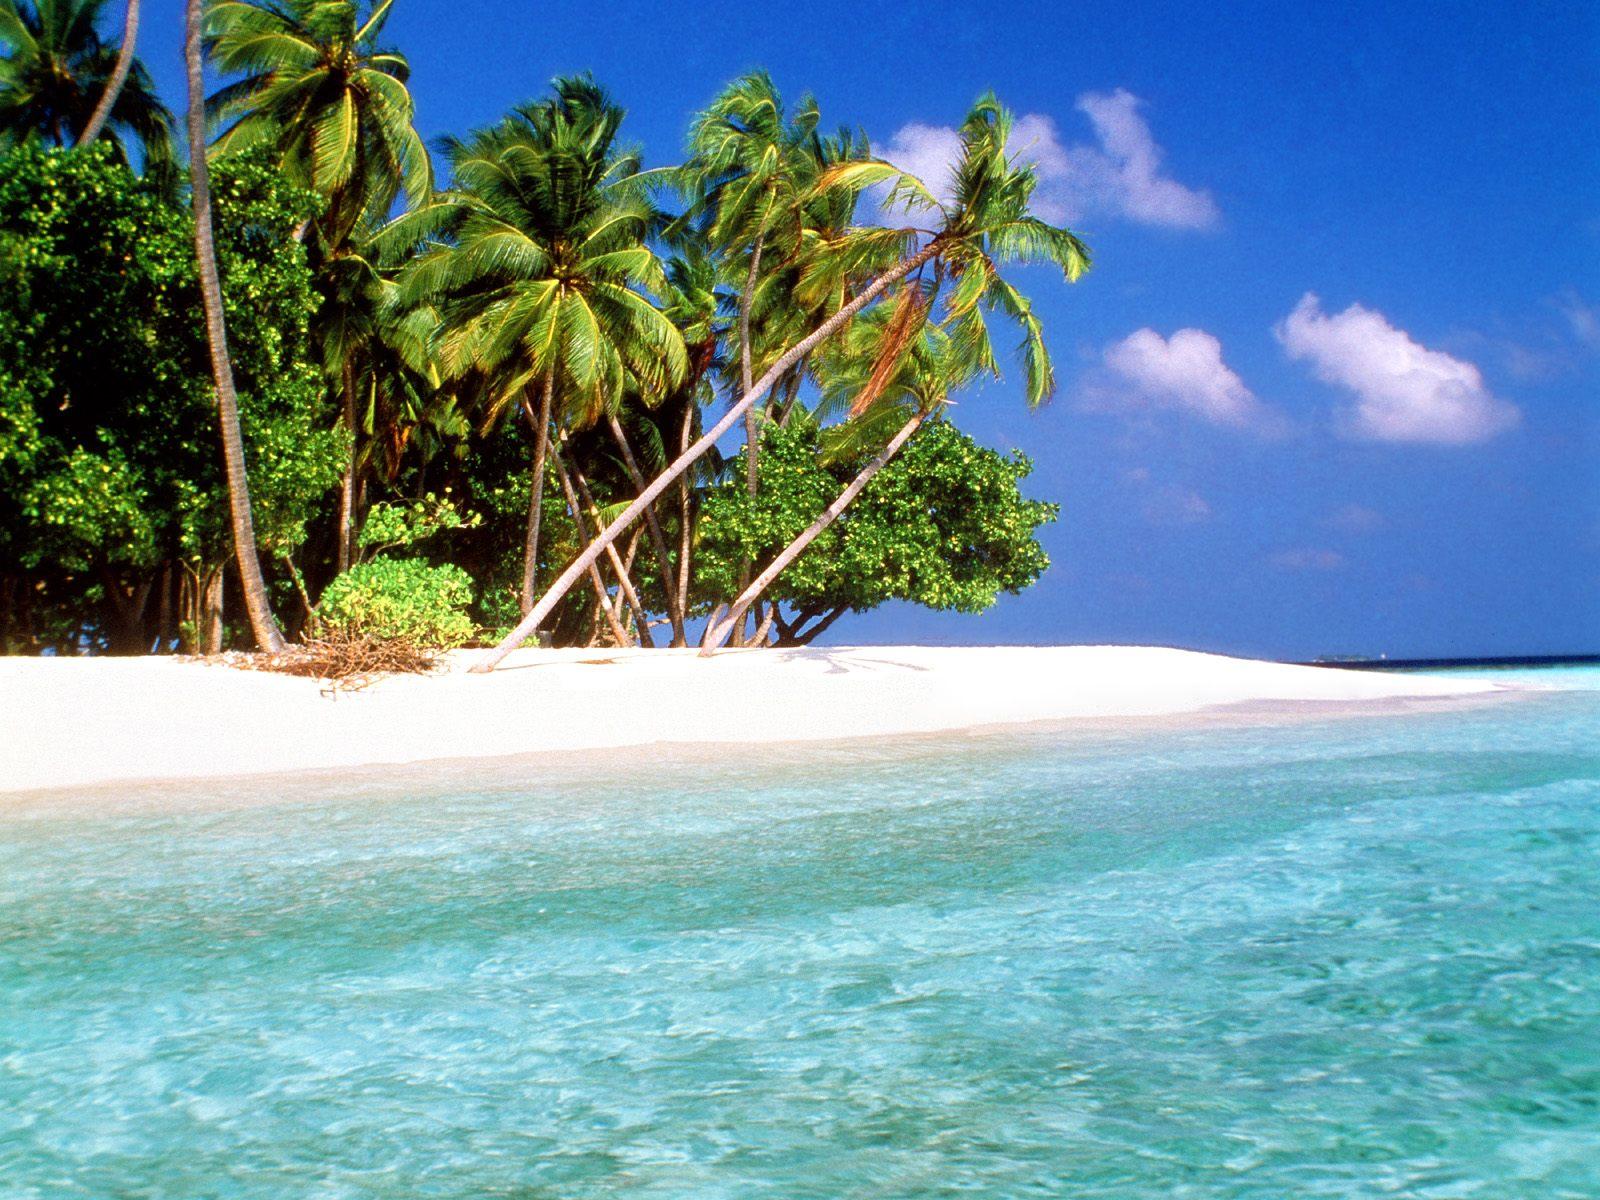 World Visits: Tropical Island Beach Wallpaper Free Review